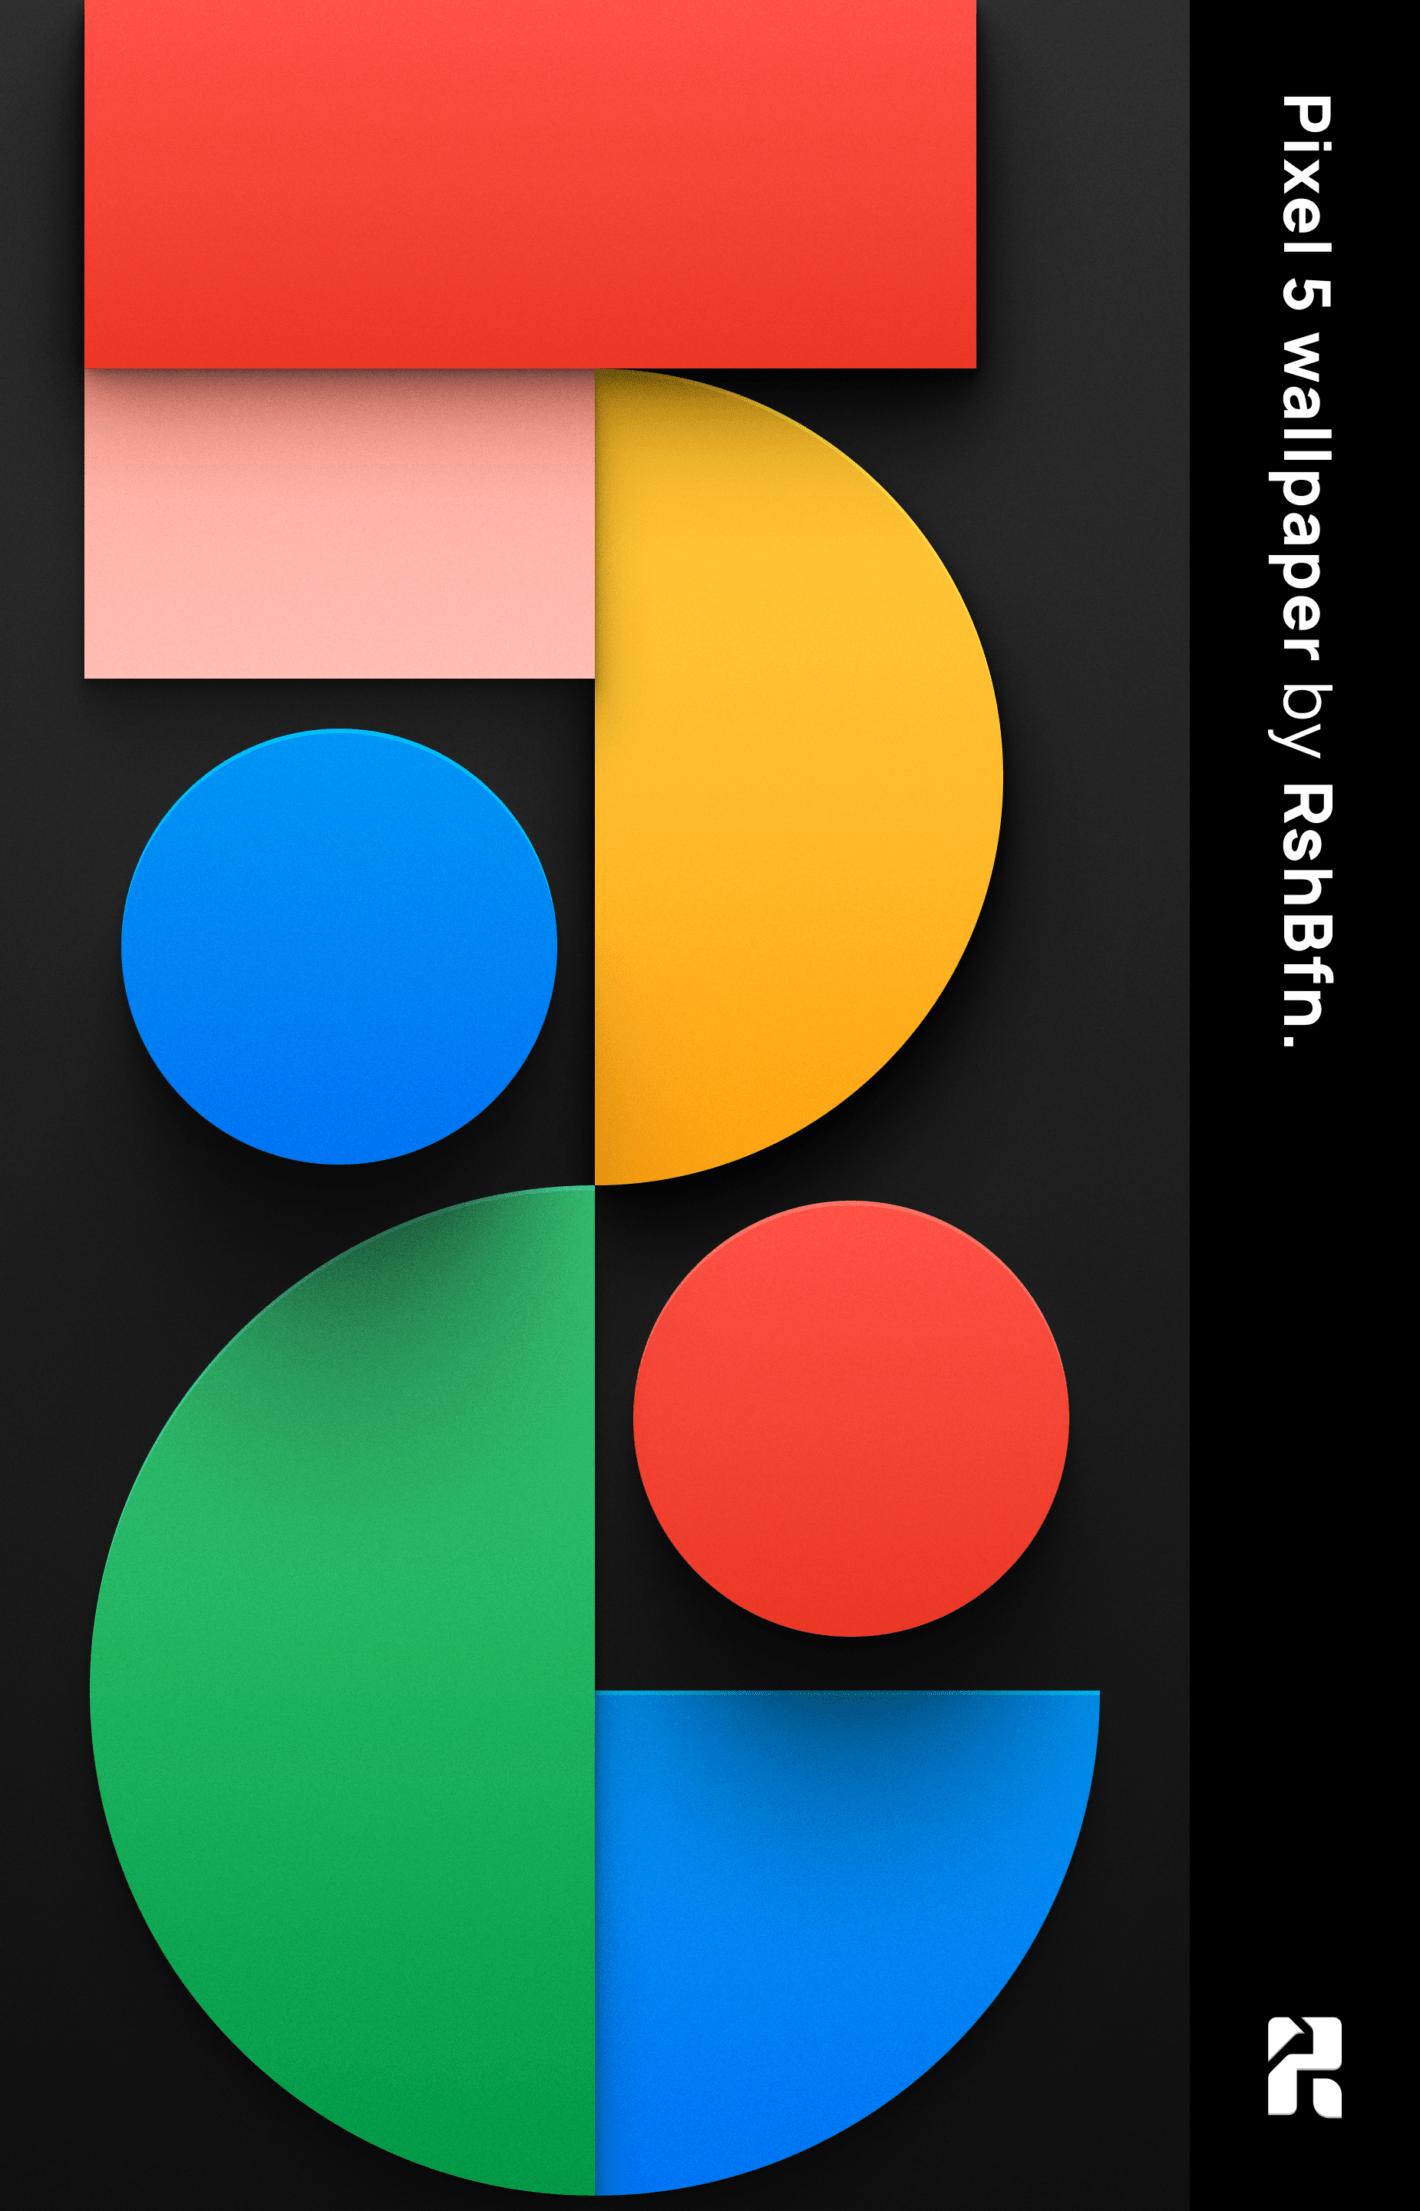 pixel 5 wallpaper RshBfn